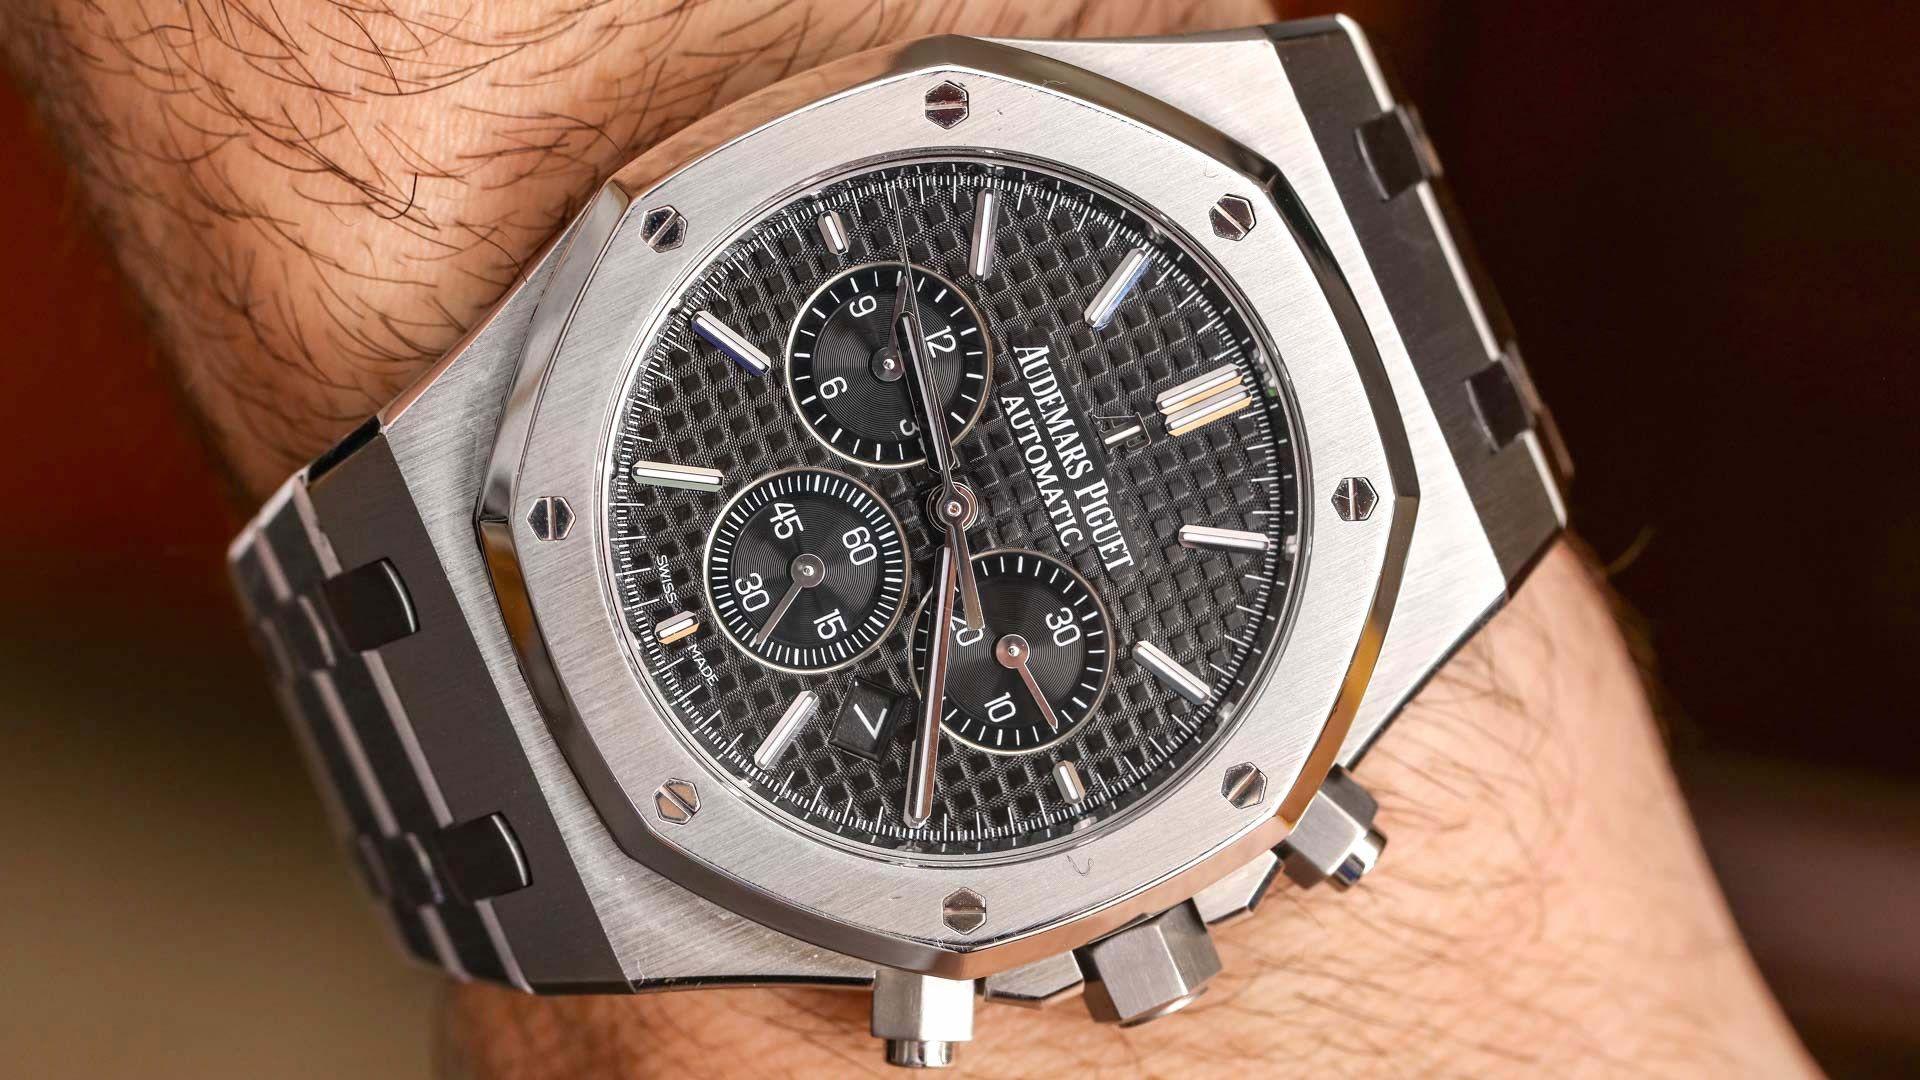 Audemars Piguet Royal Oak Chronograph 41mm Watch Review With